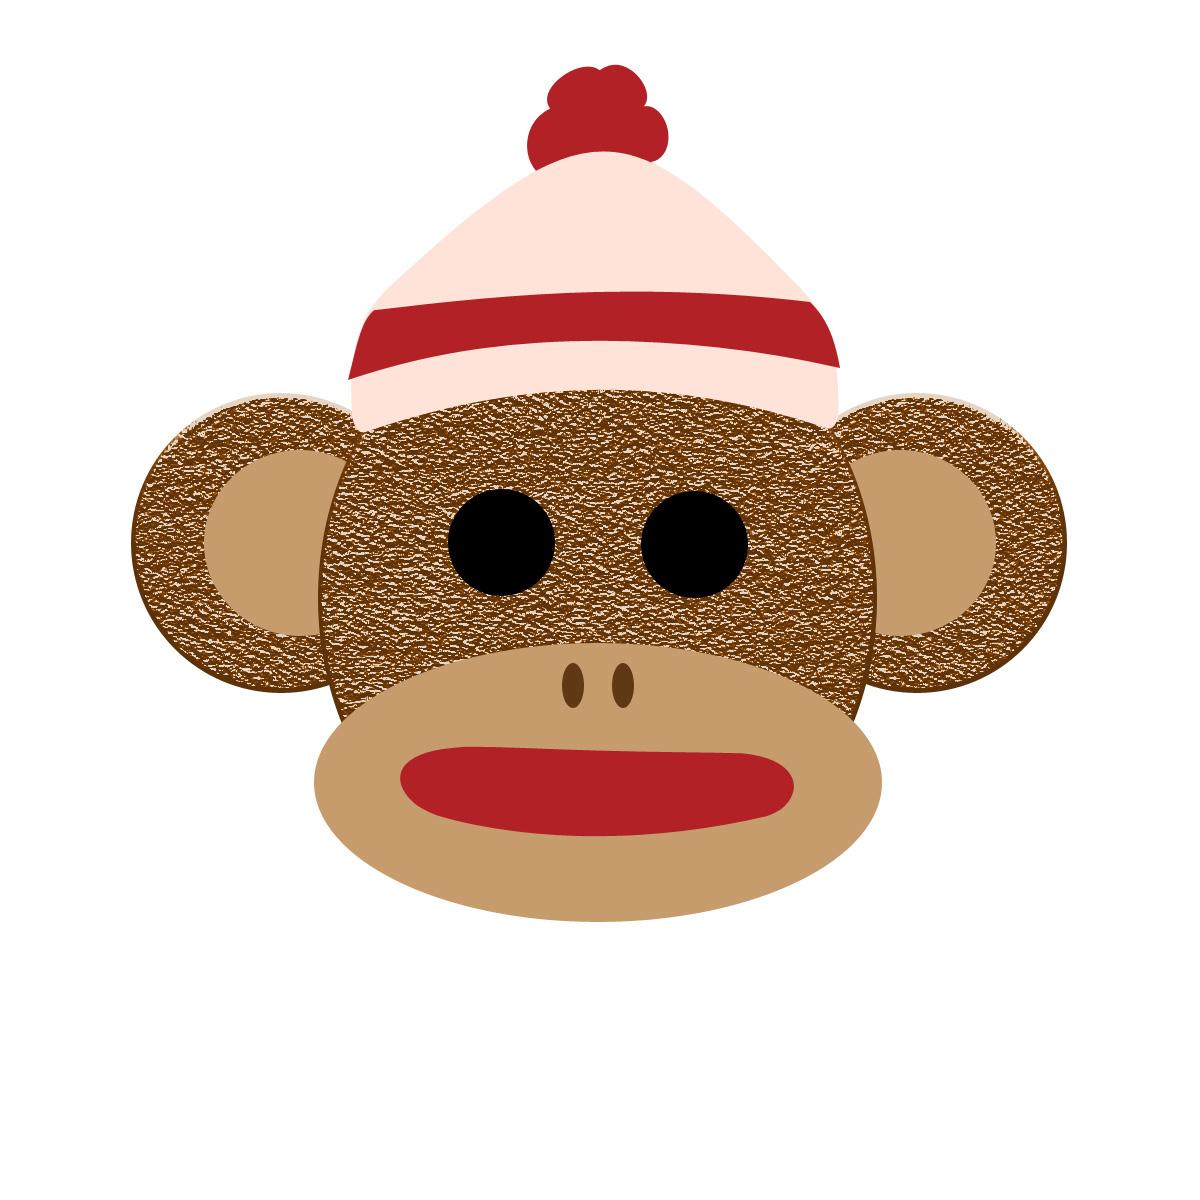 Sock Monkey Clipart Free Collection - Free Printable Sock Monkey Clip Art